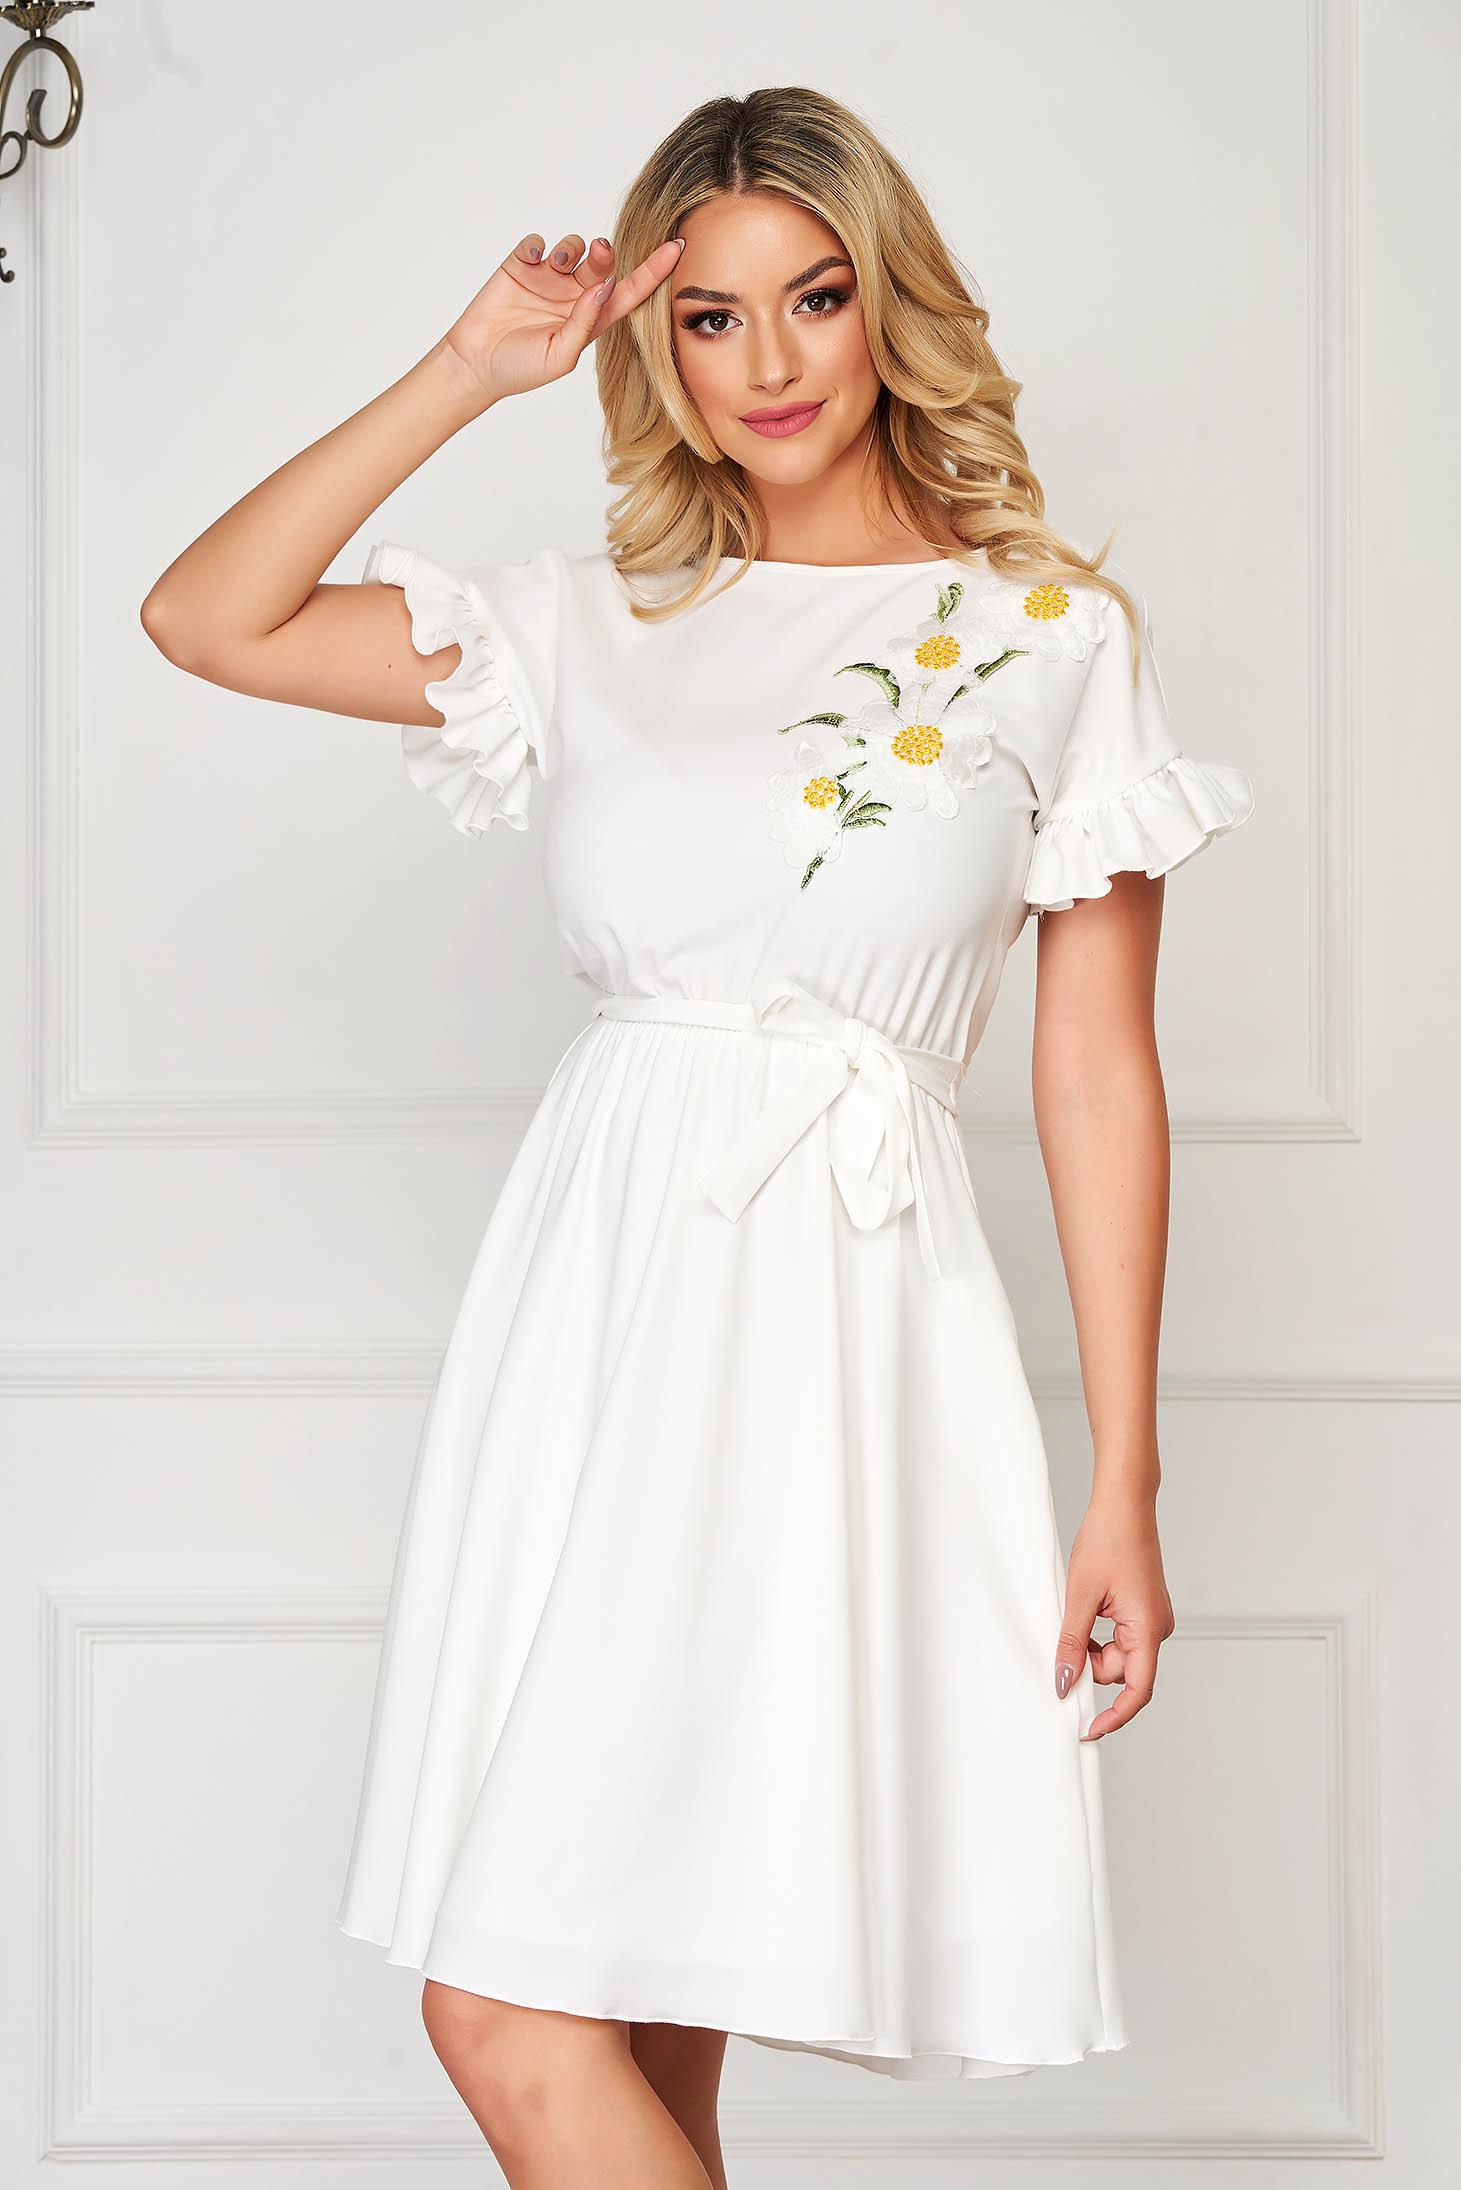 StarShinerS midi from elastic fabric with ruffled sleeves white dress cloche